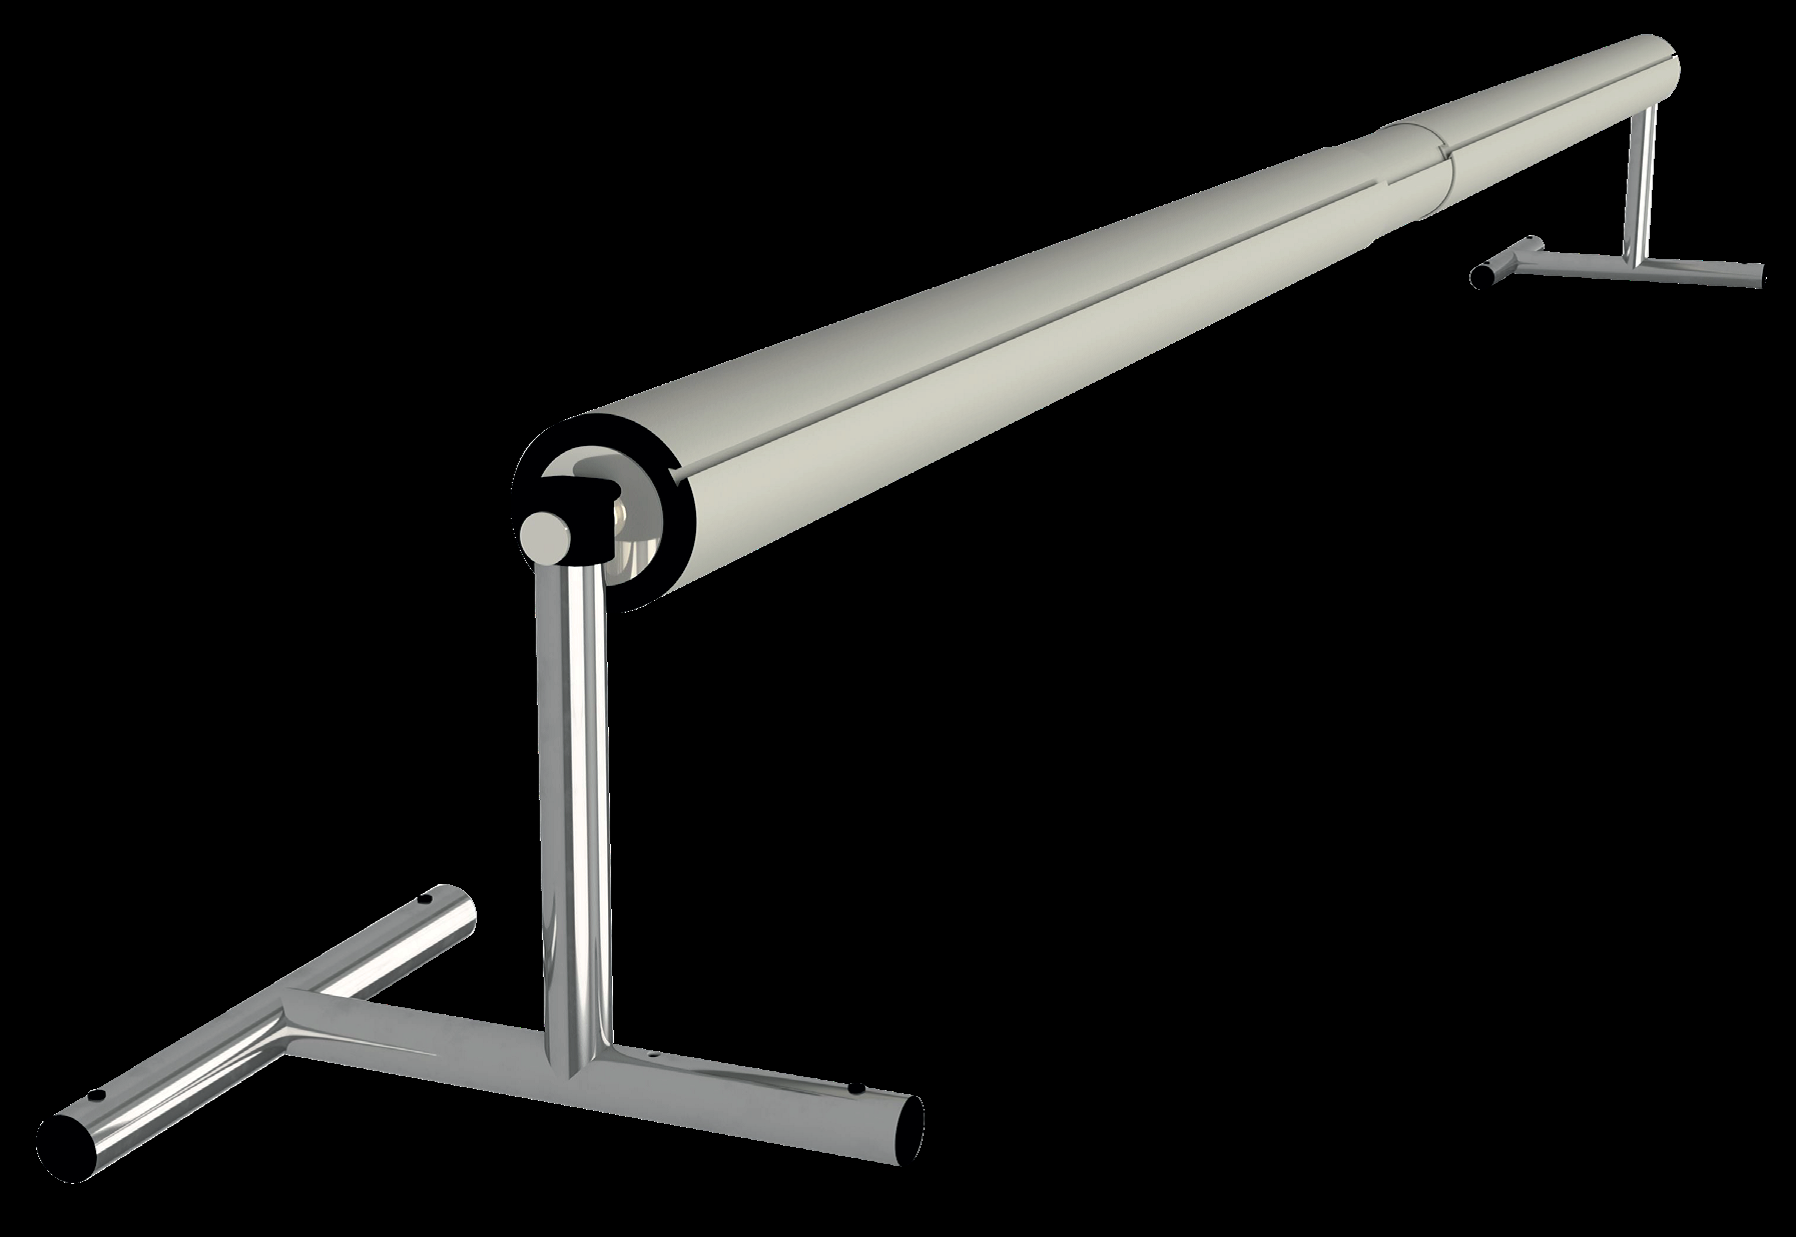 PLASTICA Slidelock Max Telescopic Reel